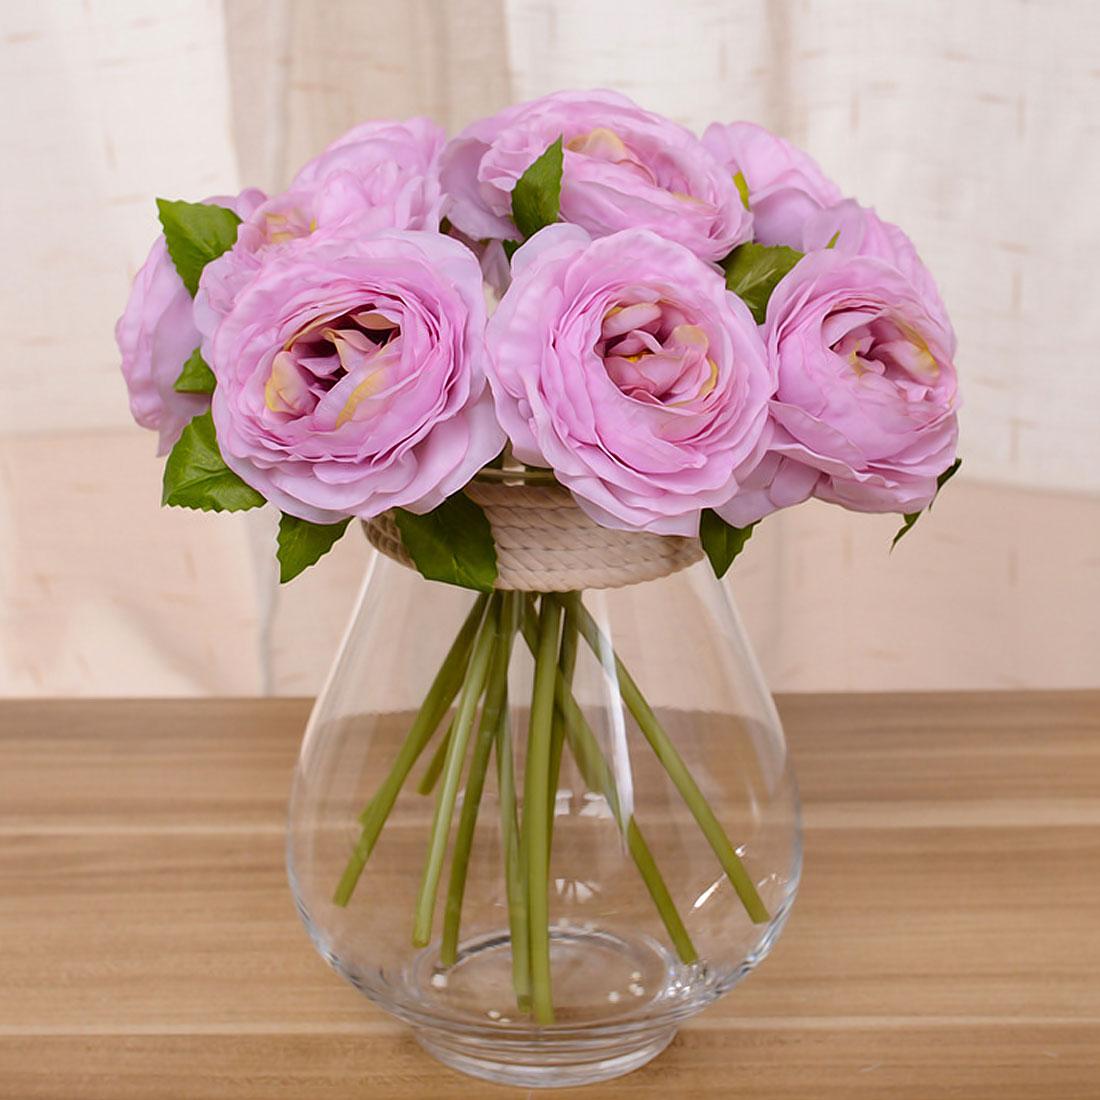 Peony Home Flower Decoration Accessories 6 Heads Silk Dahlias ...